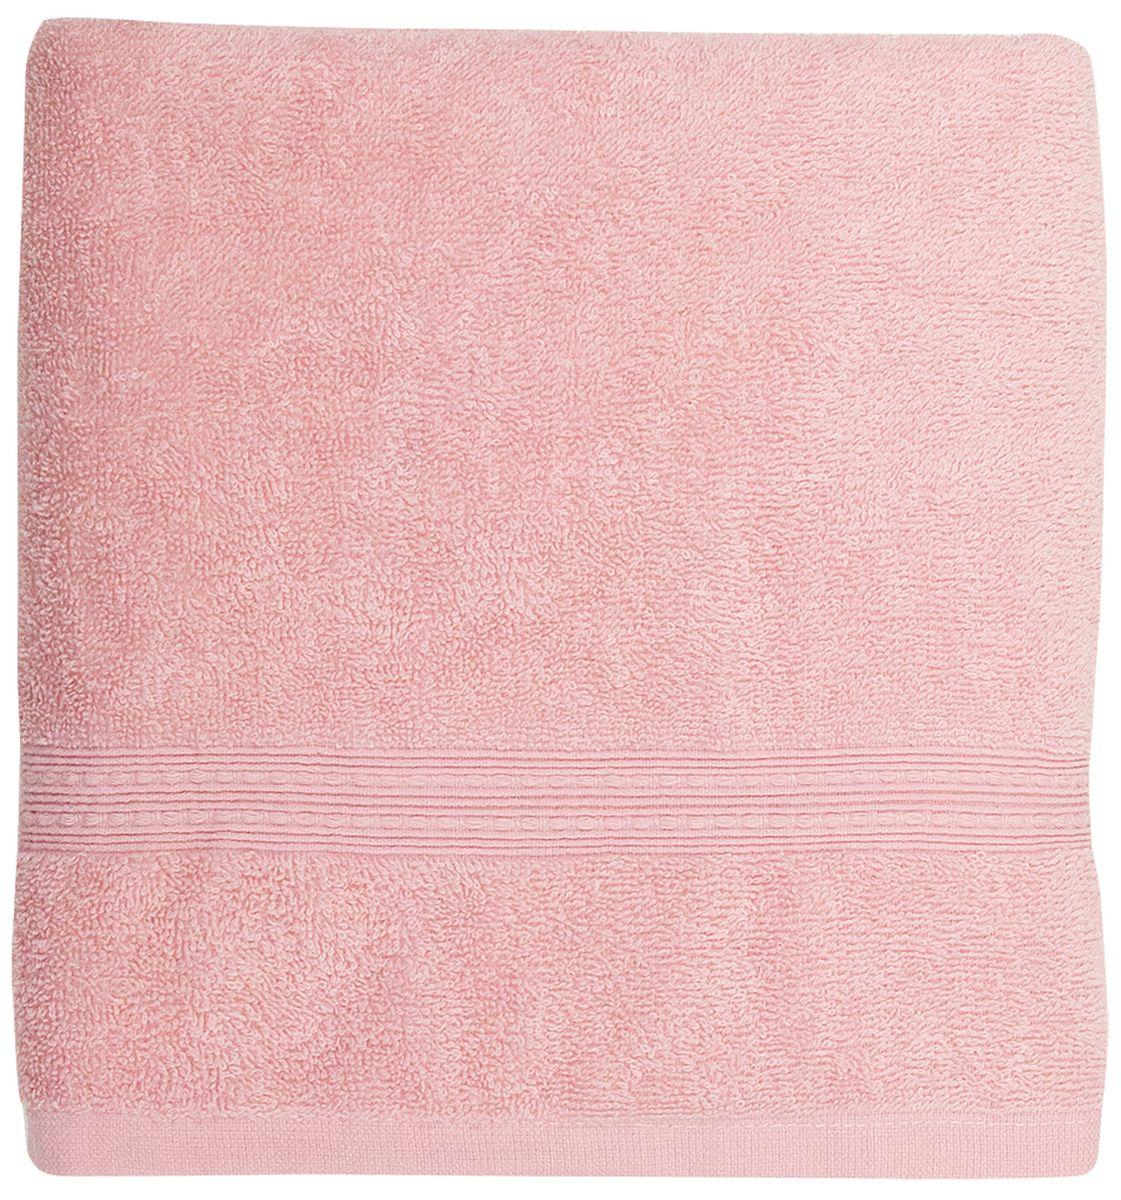 Полотенце банное Bonita Classic, махровое, цвет: роза, 50 x 90 см68/5/3Полотенце банное 50*90 Bonita Classic, махровое